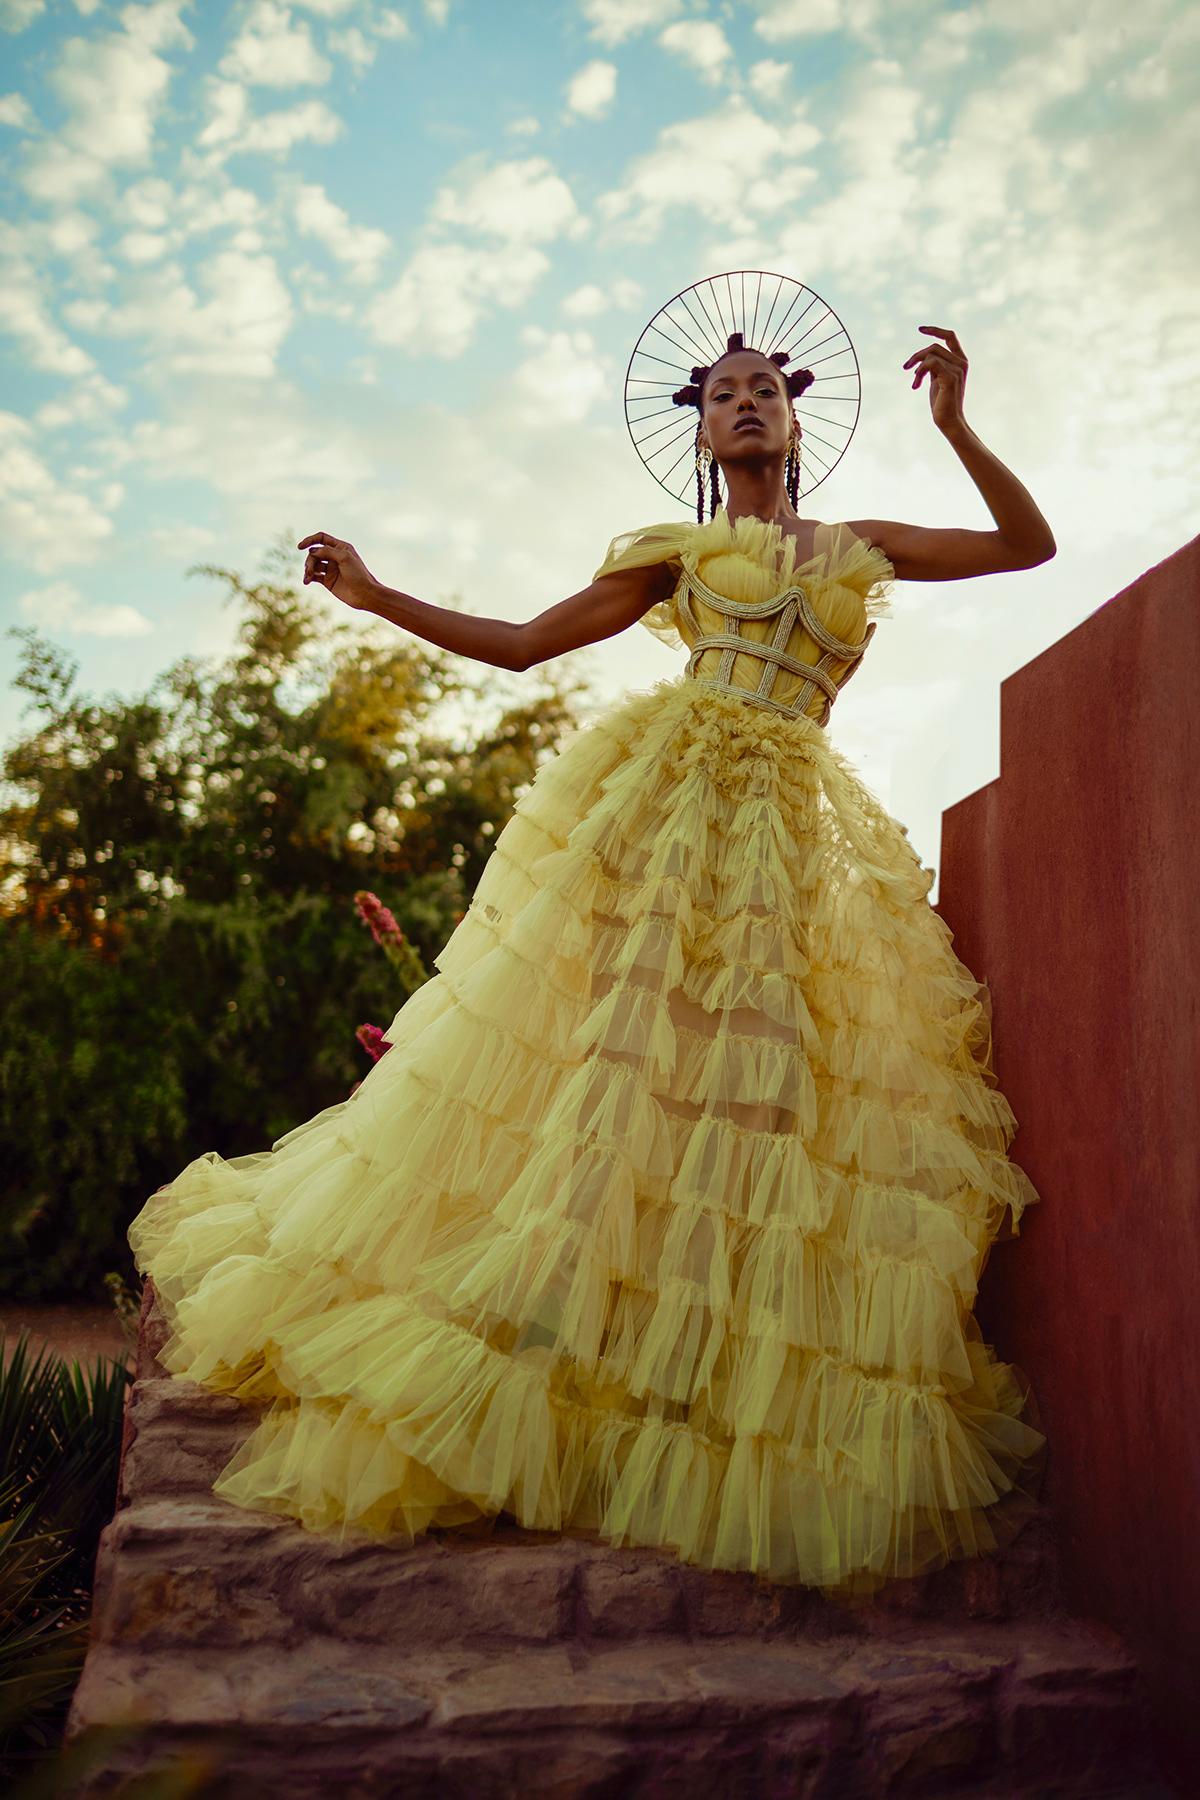 Image may contain: wedding dress